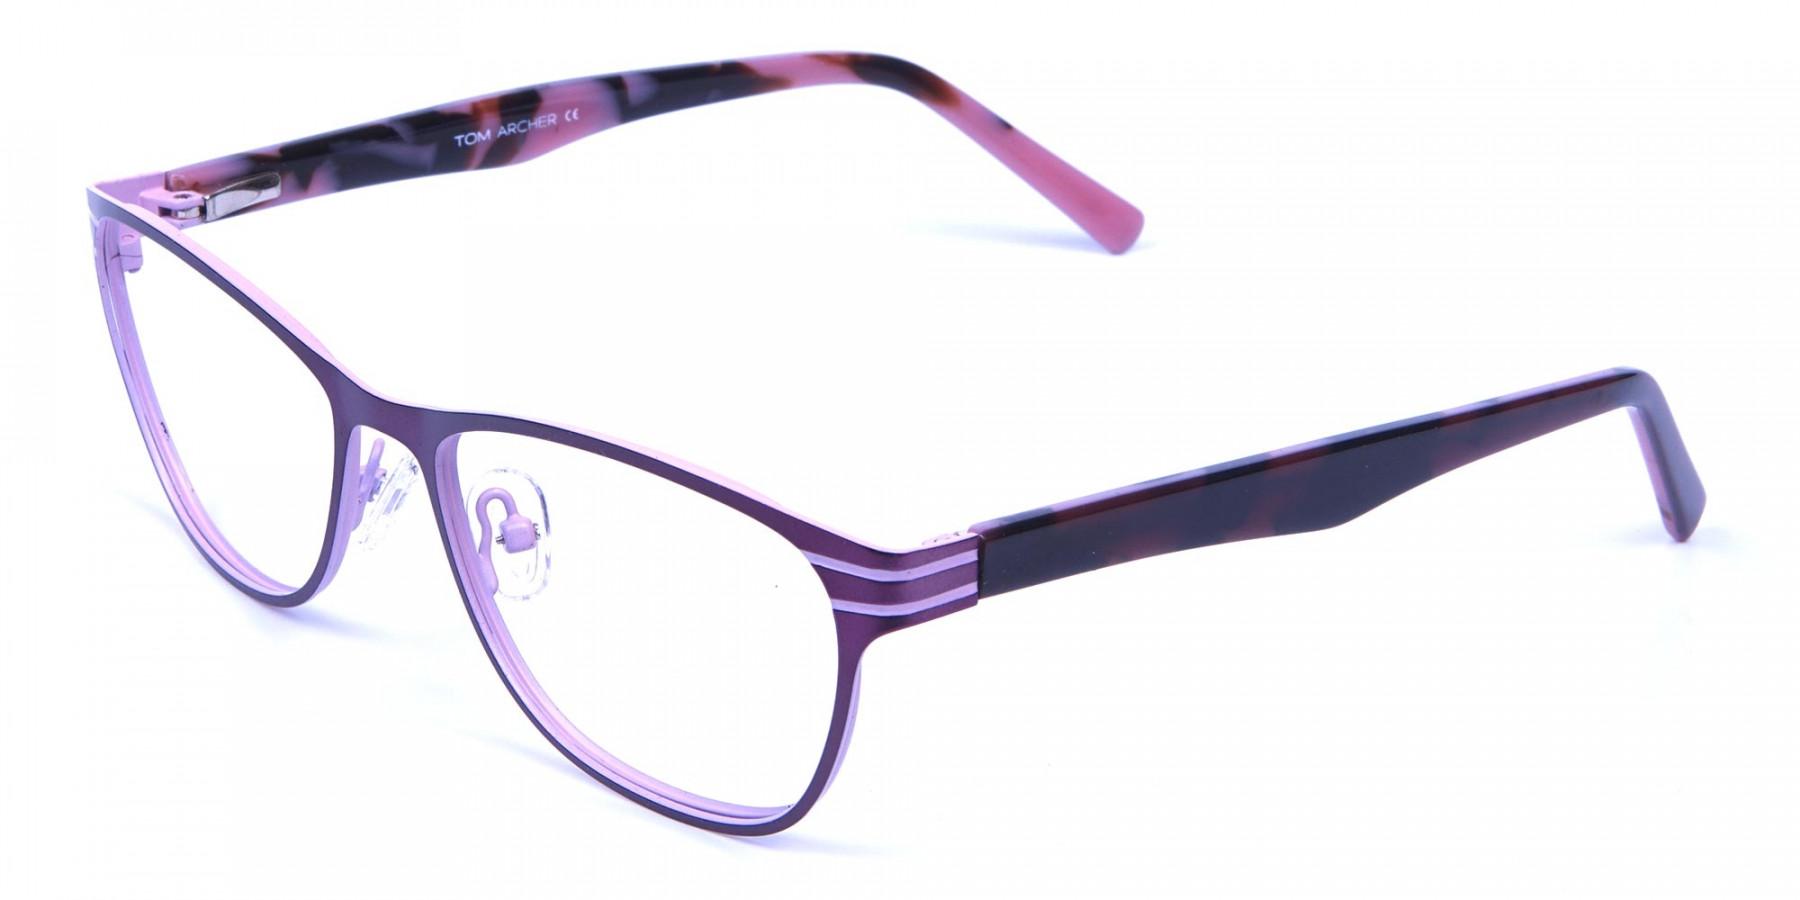 Pink & Black Cat Eye Glasses